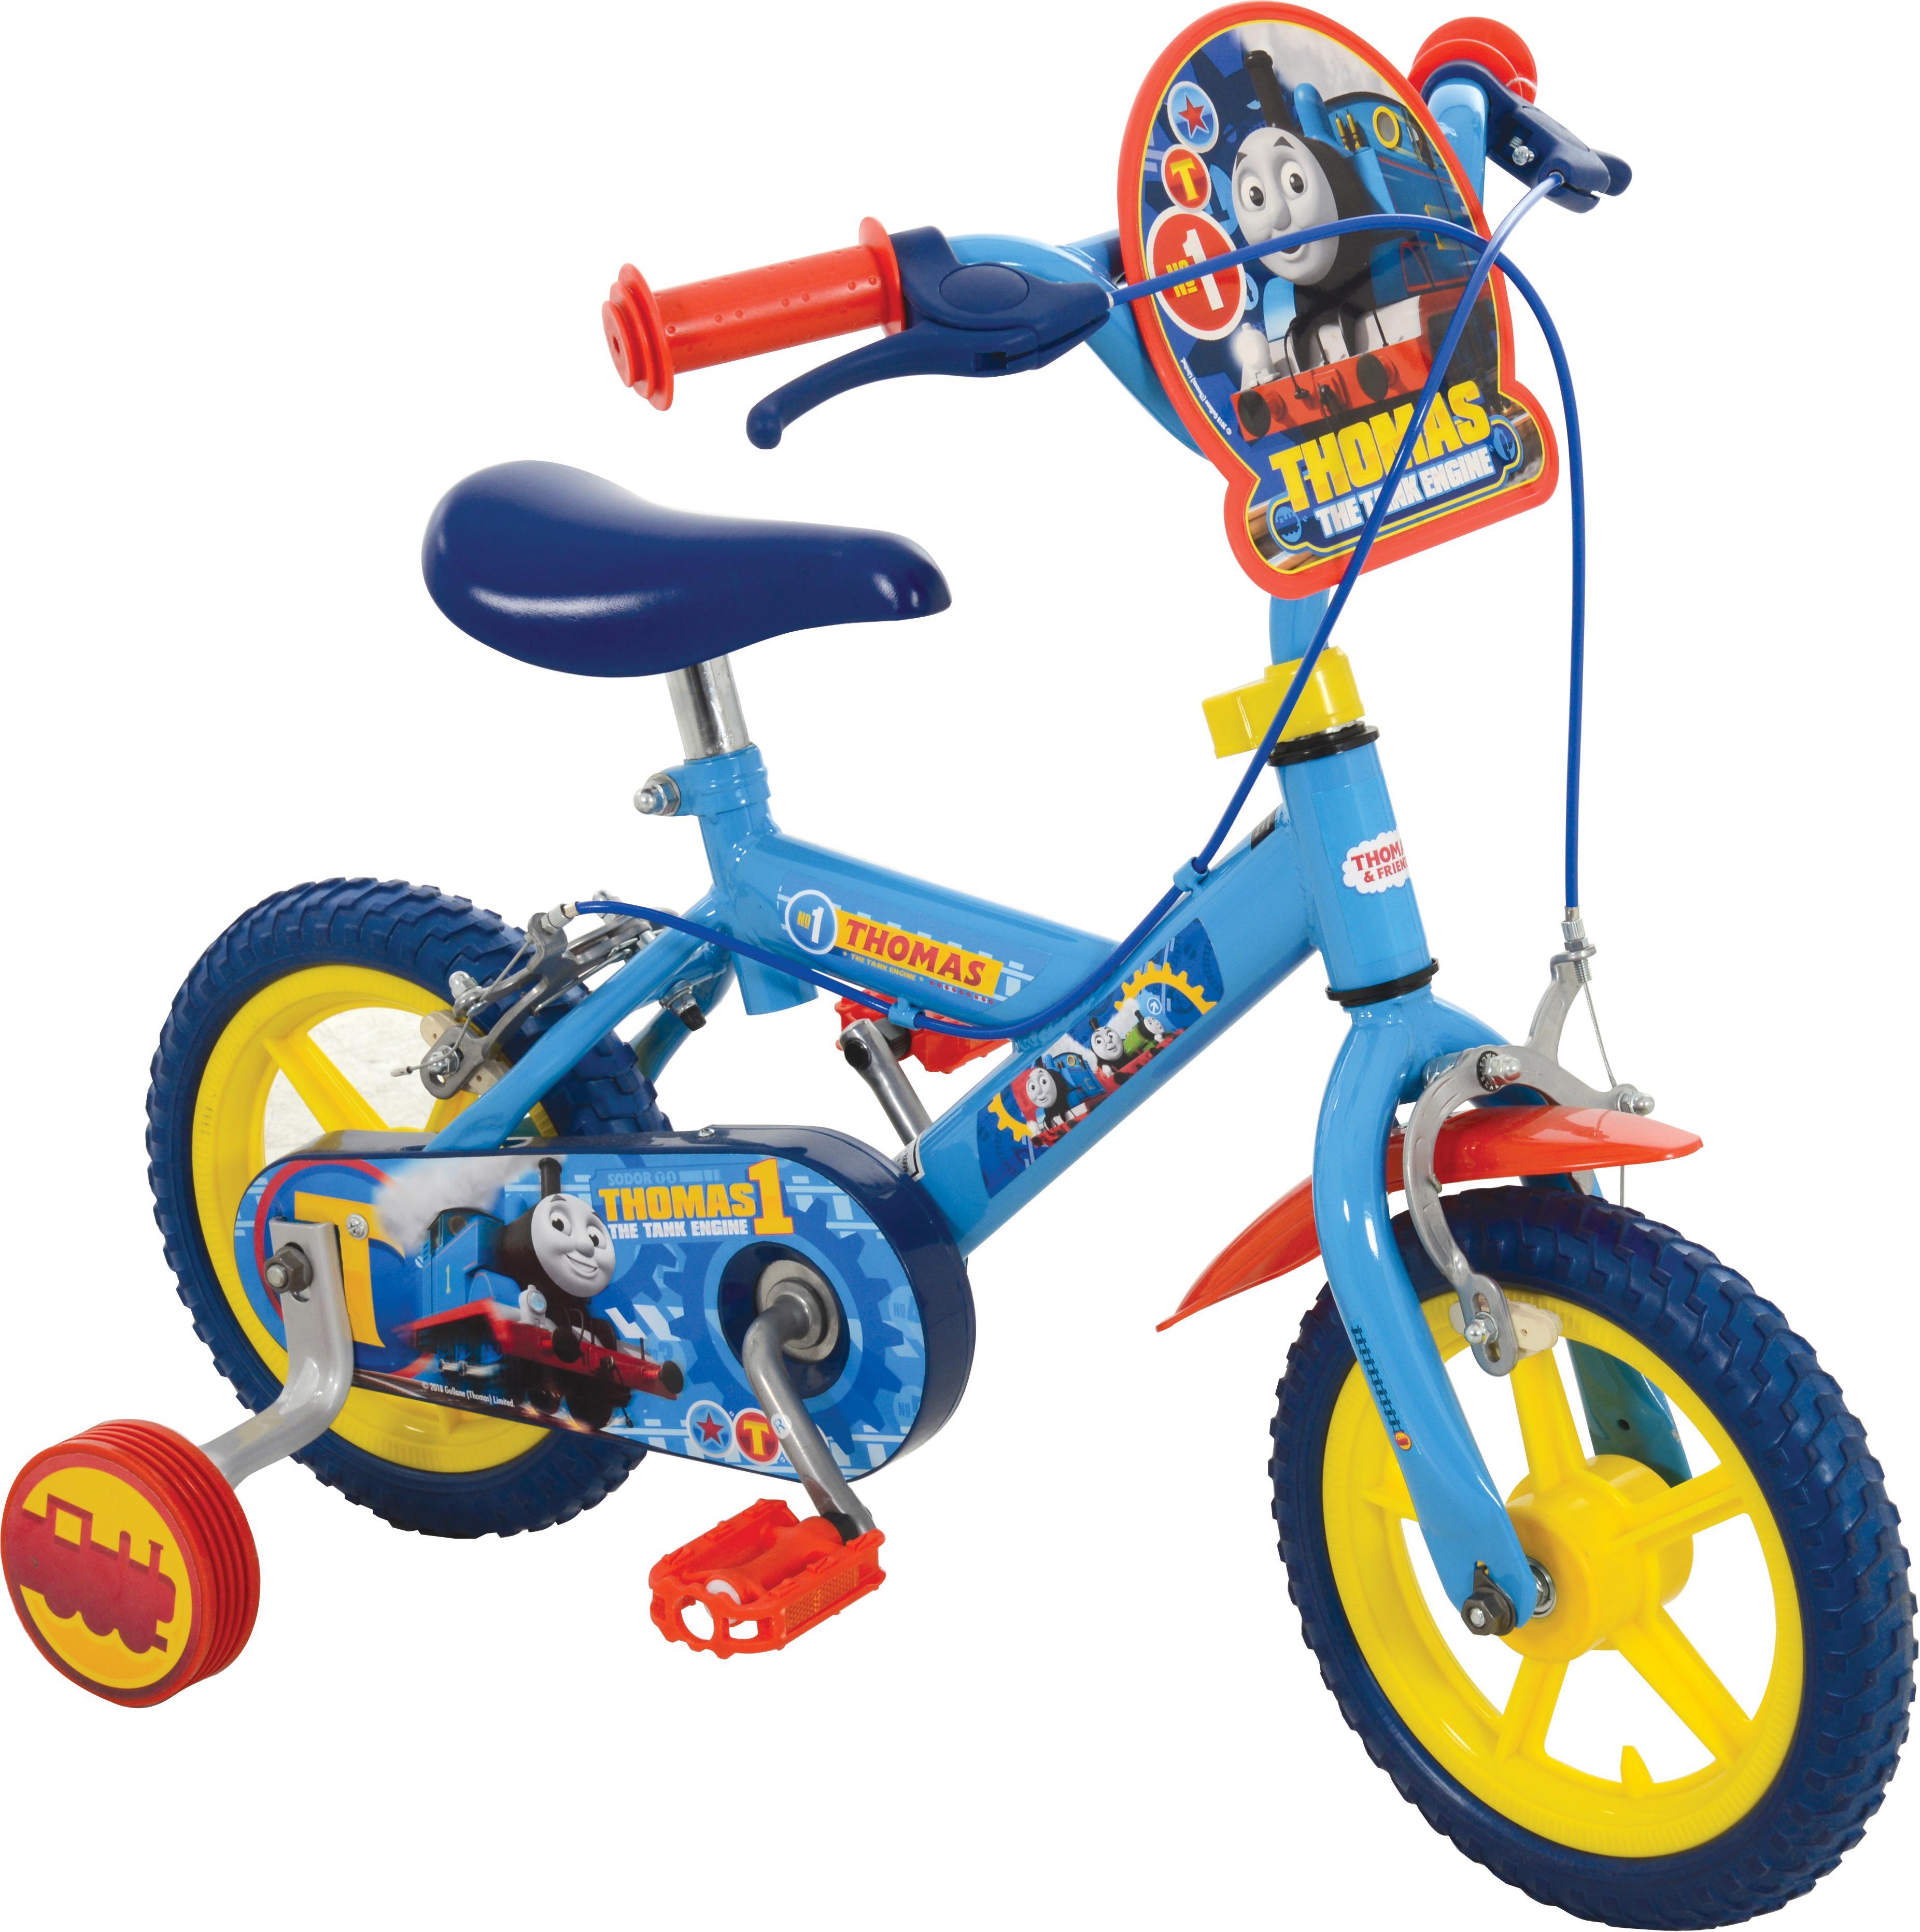 Thomas and Friends Kids Bike - 12 inch Wheel